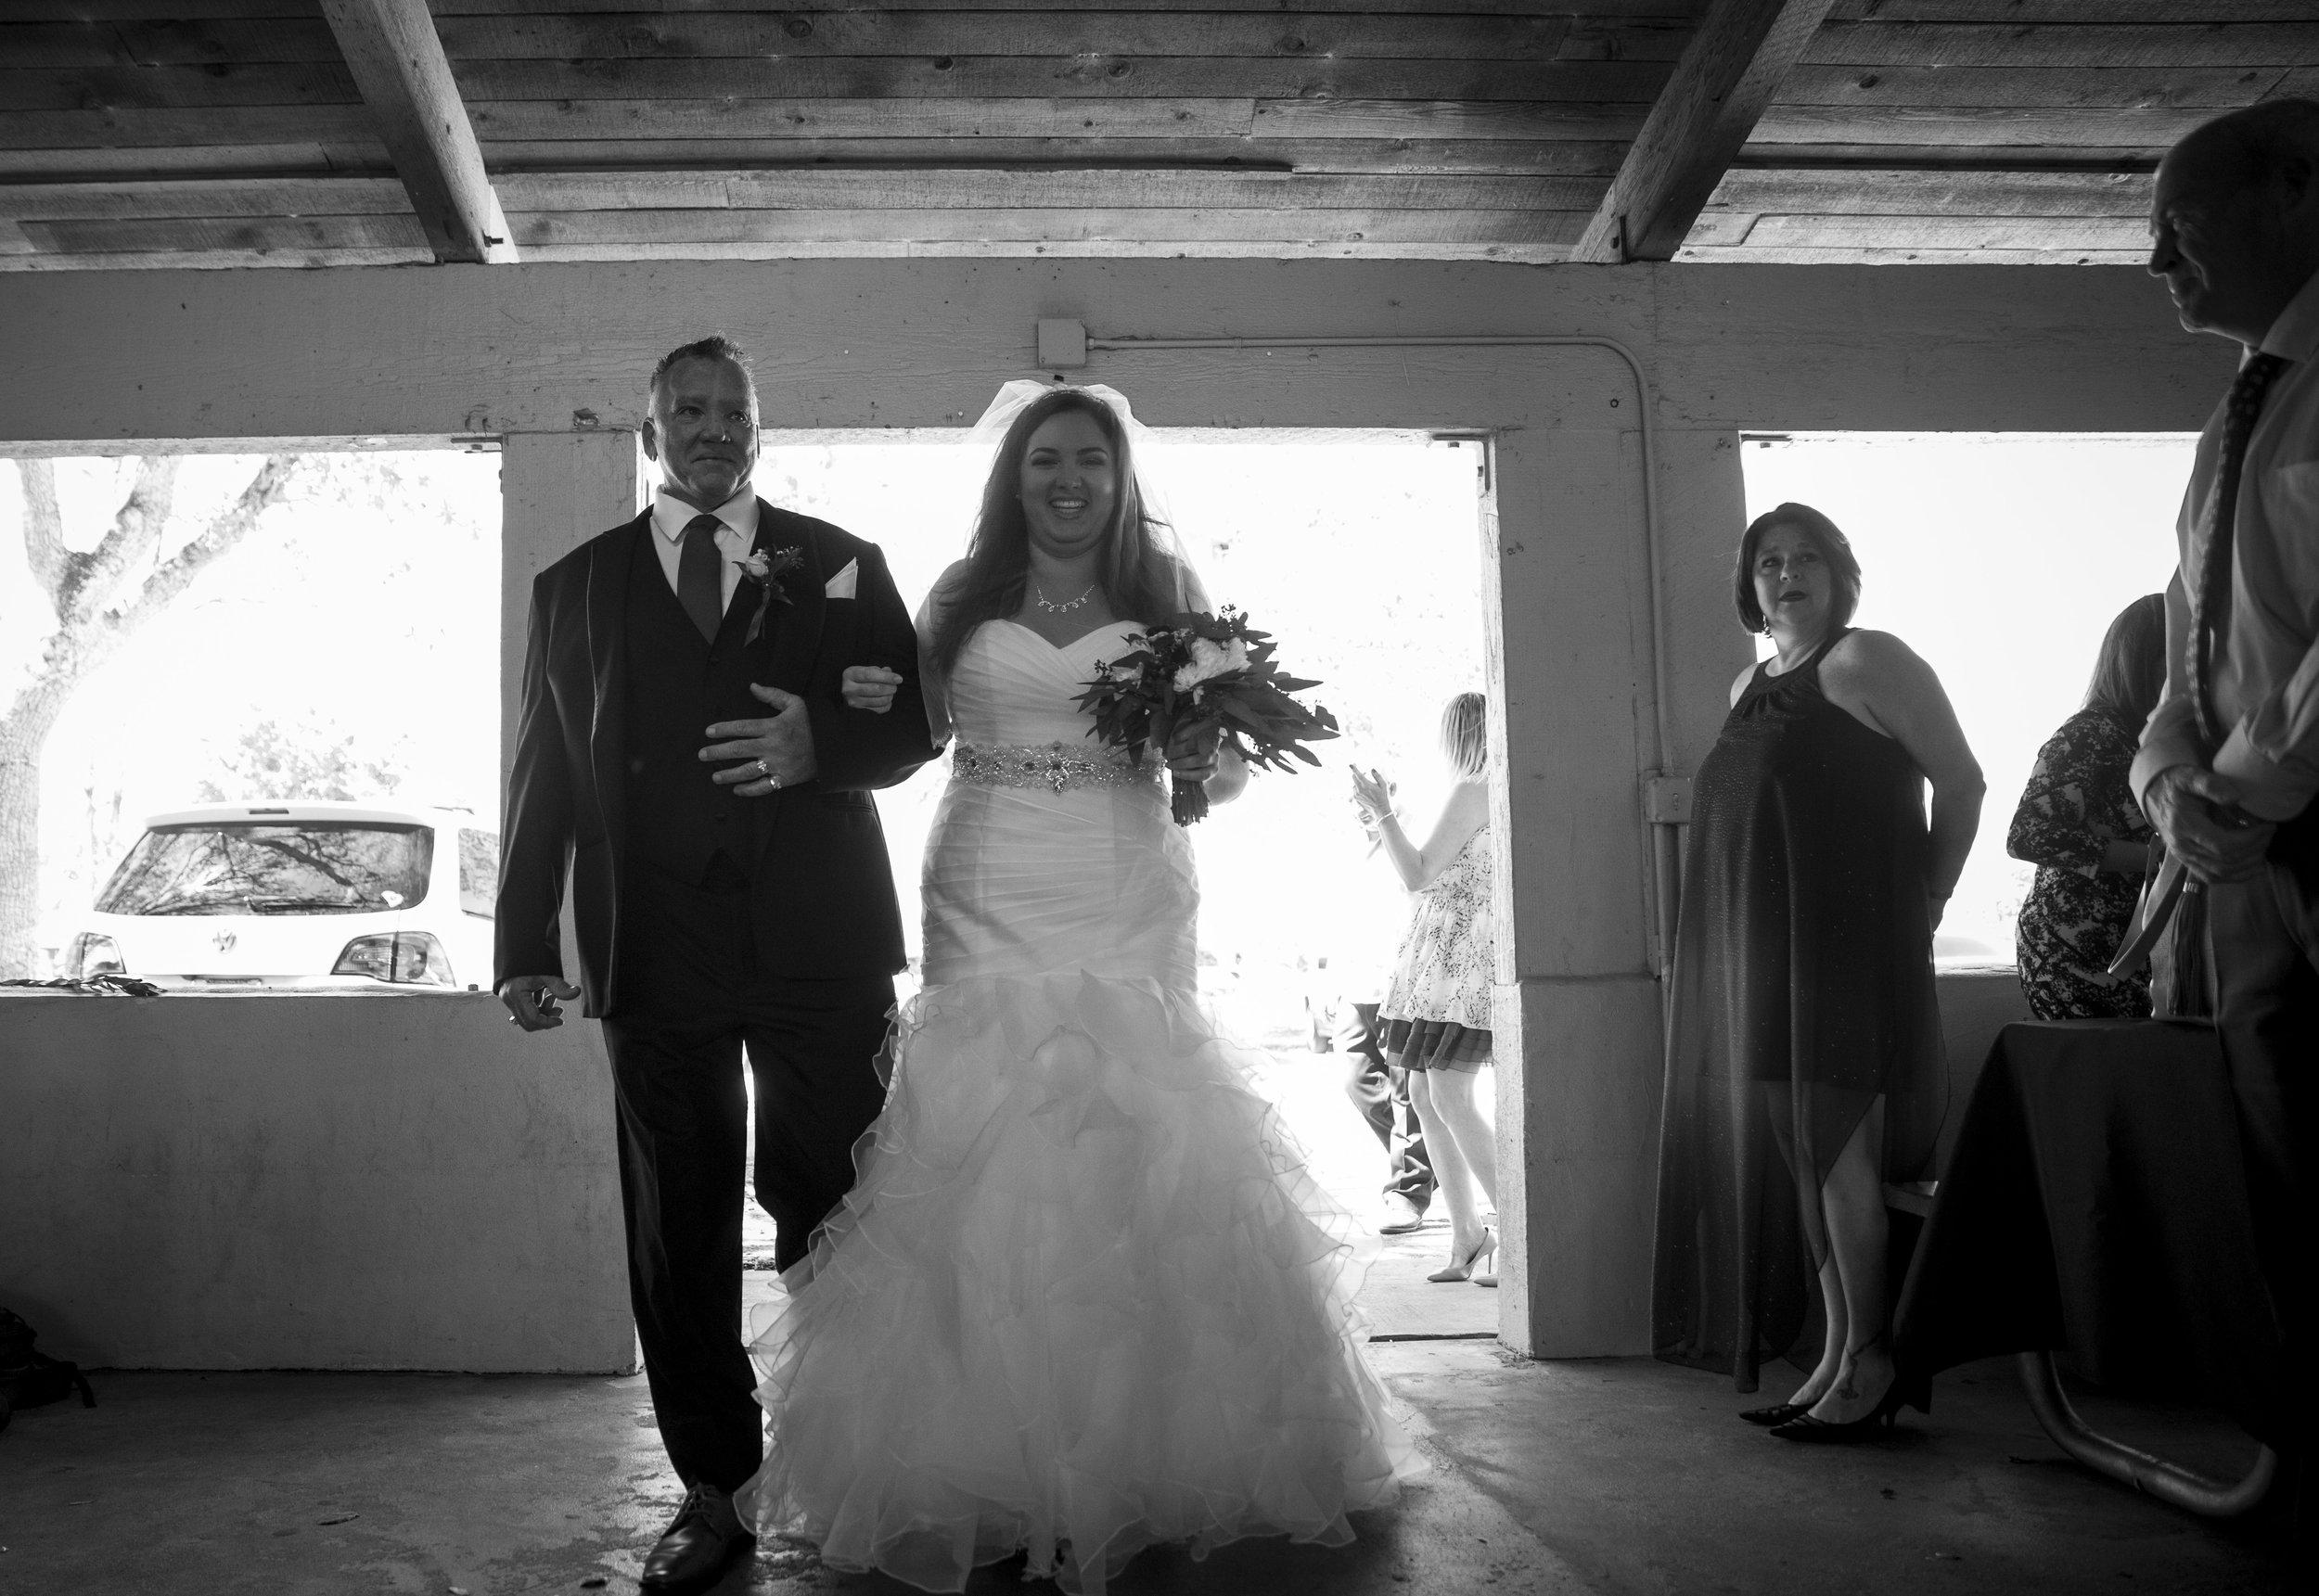 outdoor-rustic-wedding-cbsmith-park-sl-425.jpg